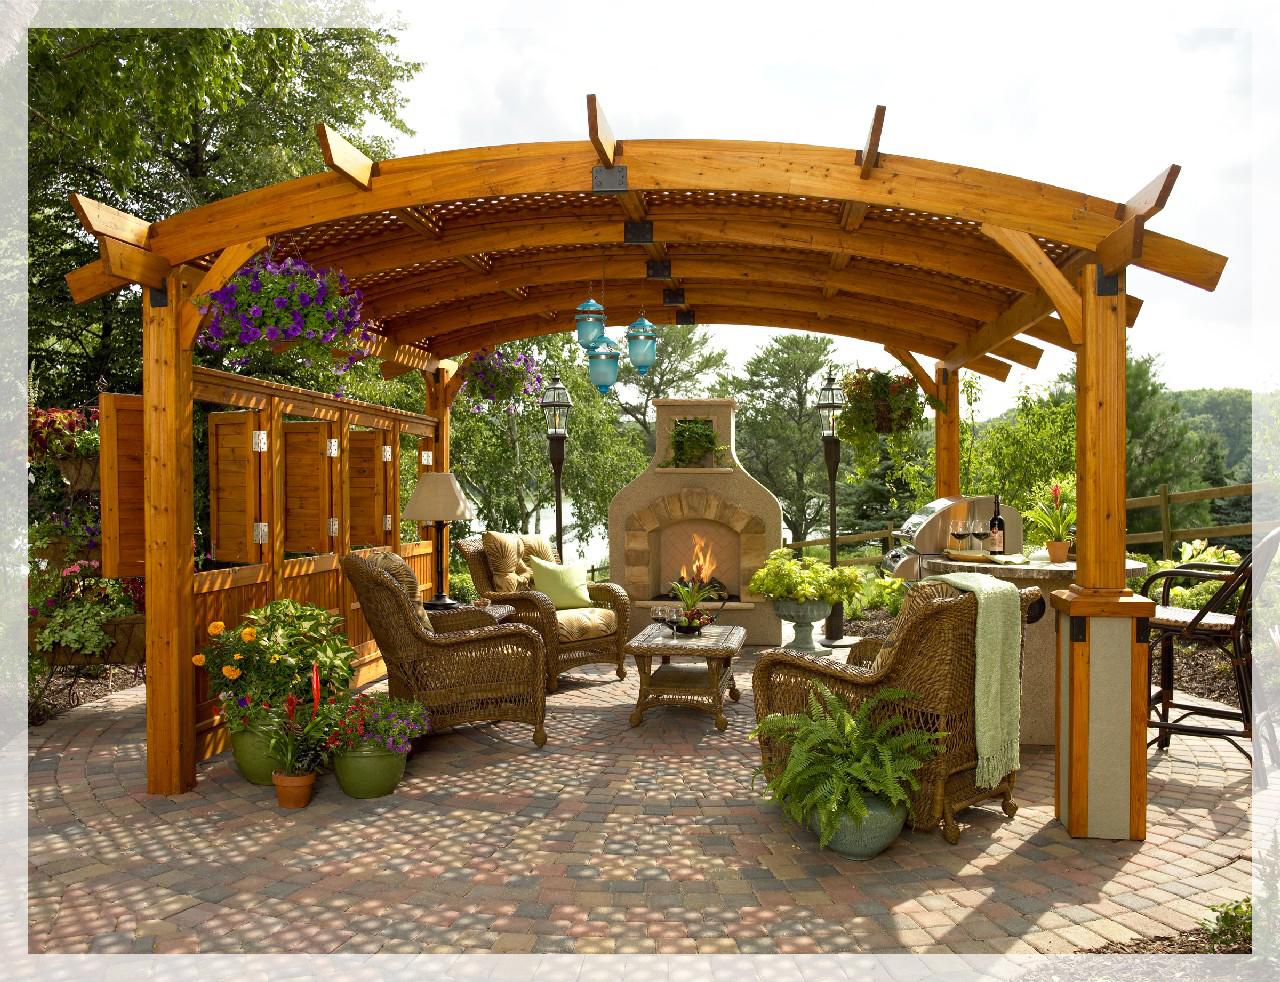 Full Size of Pergola Modern Pergolas Modernas Para Terrazas Kits Usa Uk De Hierro Designs Pinterest Design Holz Bausatz In Dubai Wooden Luxury Uae With Deckenleuchte Wohnzimmer Pergola Modern